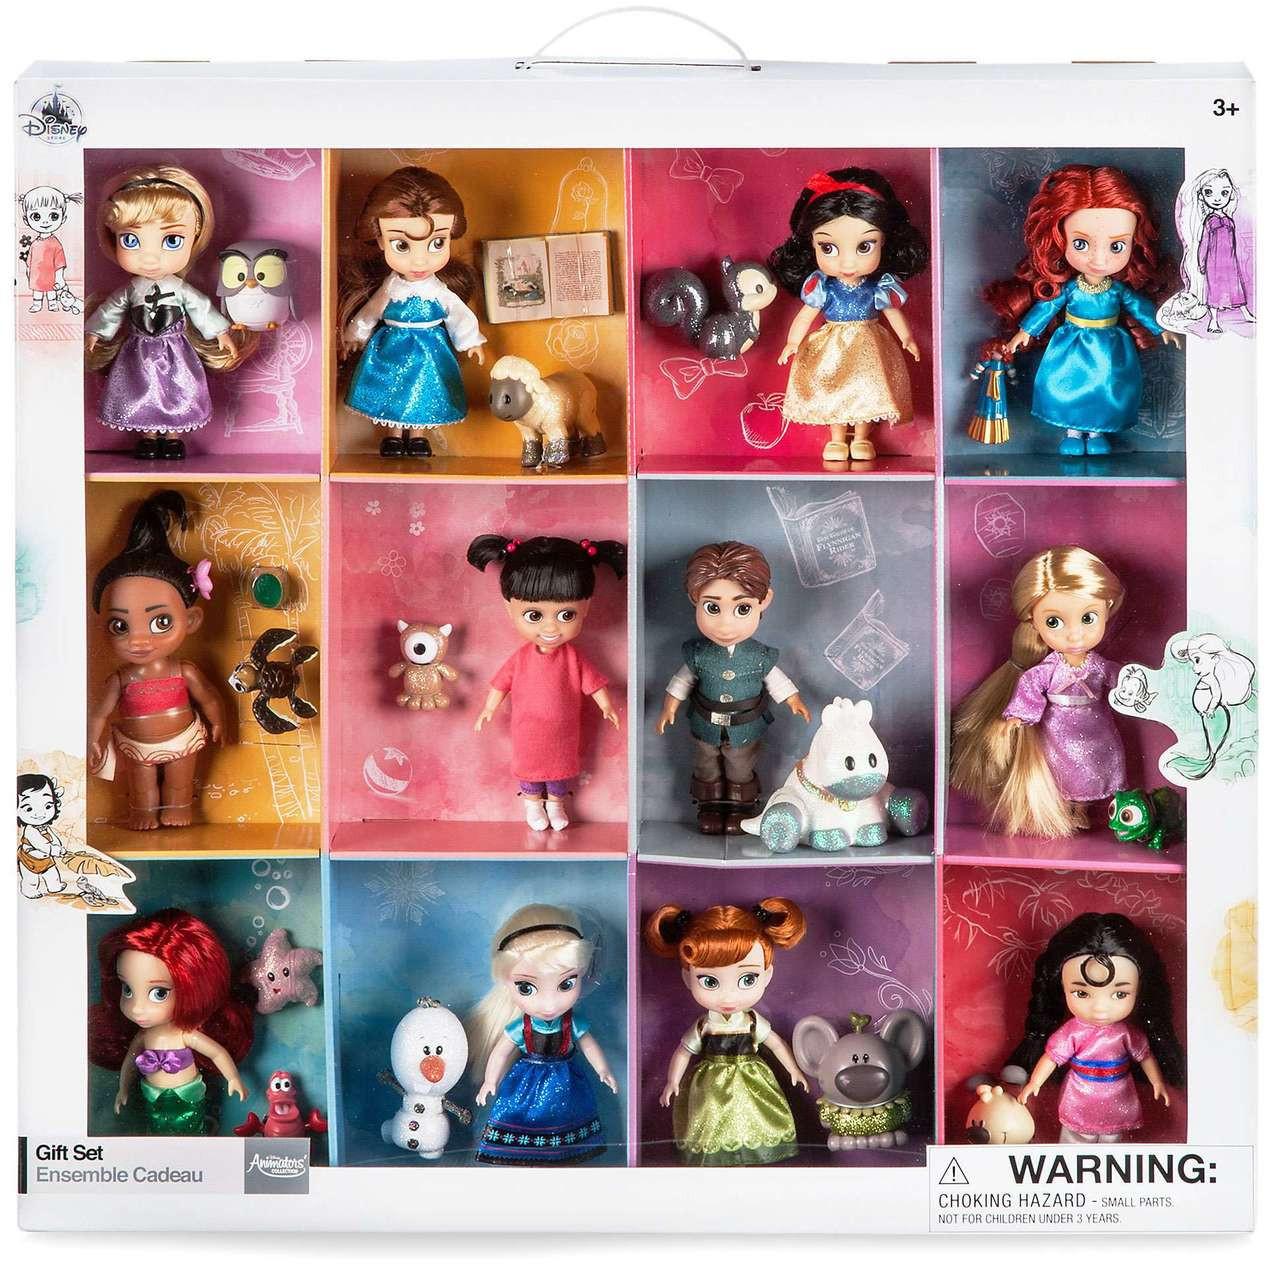 Disney Princess Mini Animator Doll 6 Piece Toy Playset Ariel Tinkerbell moana